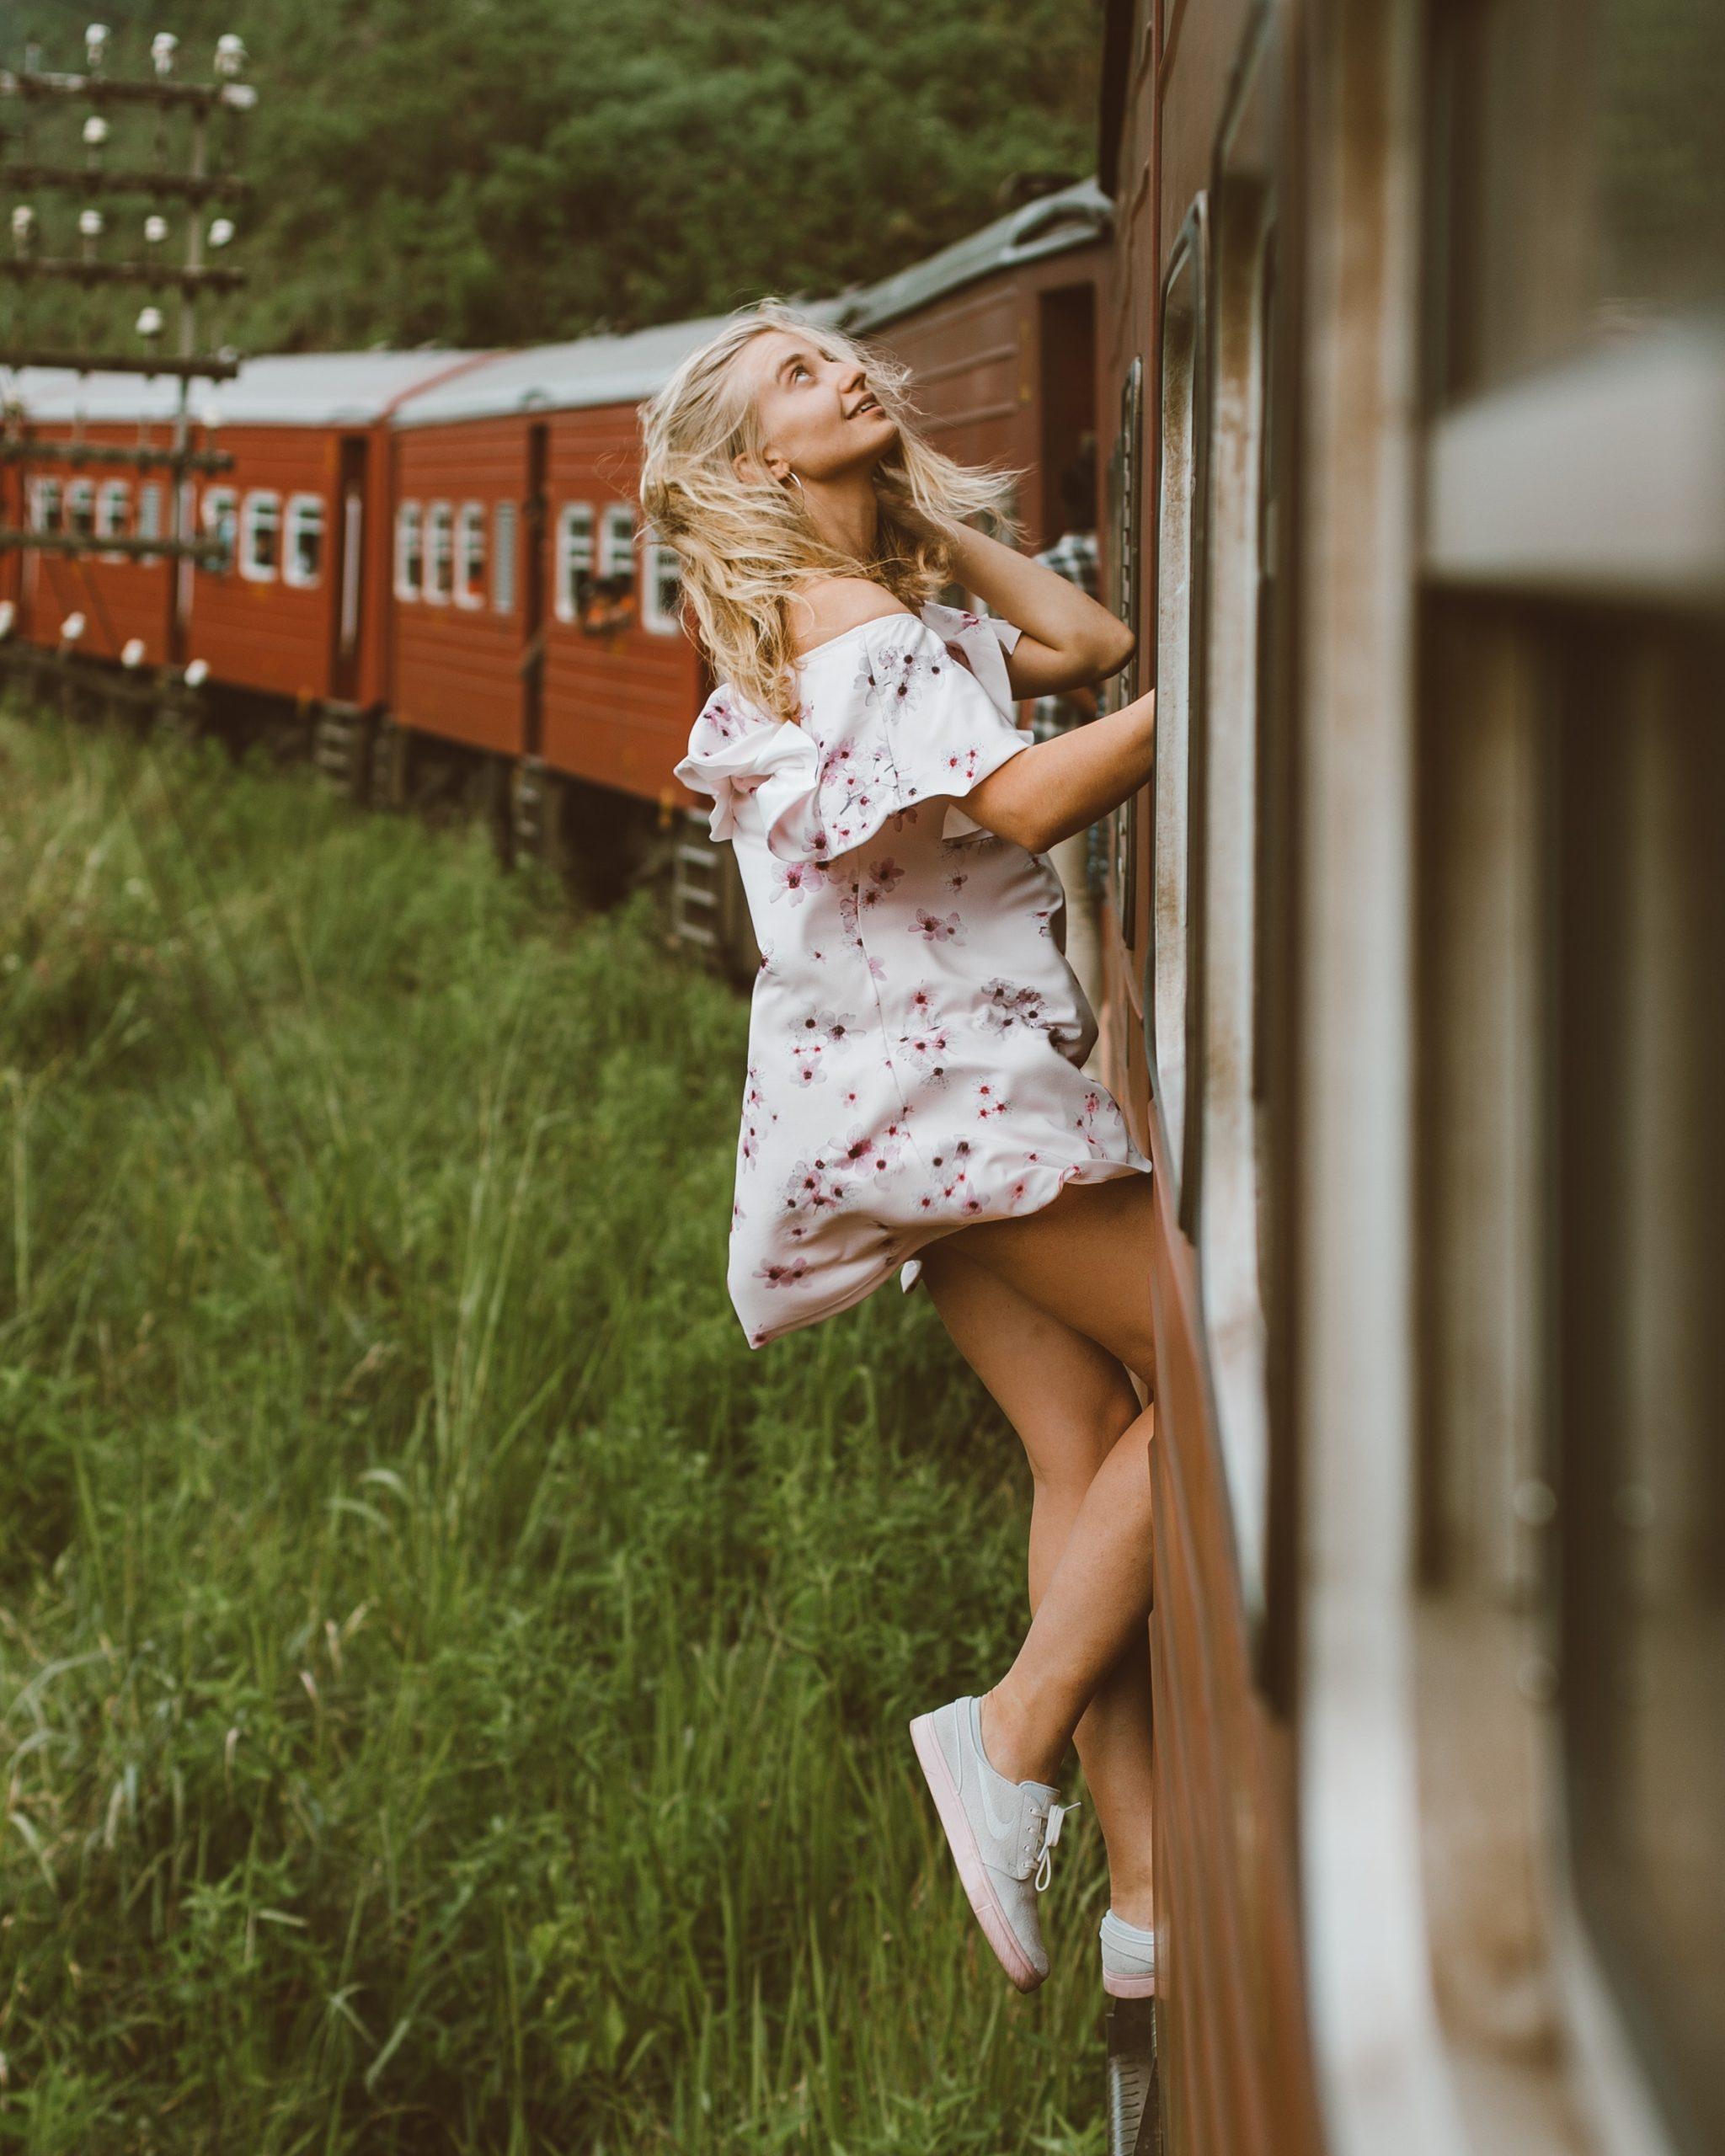 Train travel captions for Instagram-Websplashers